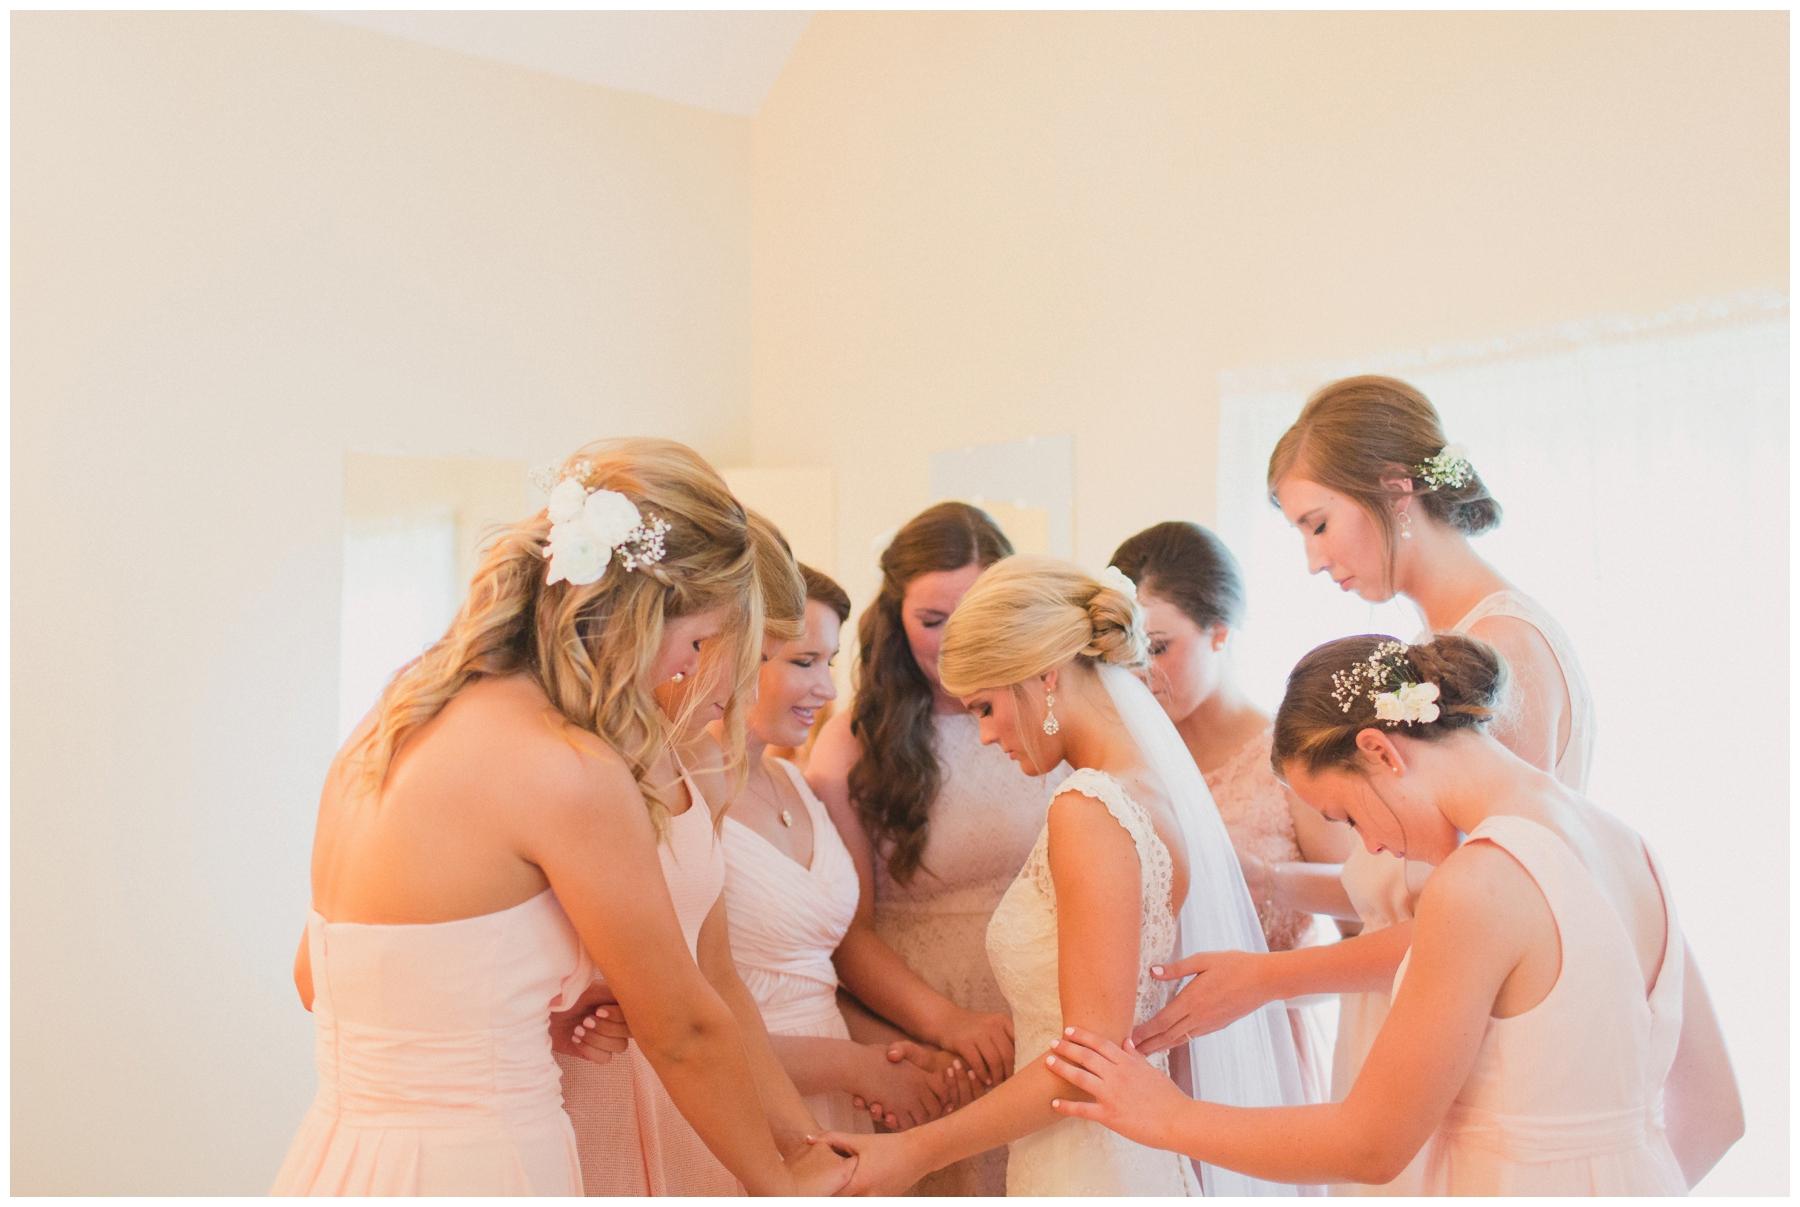 allison-corrin-kansas-city-engagement-wedding-photographer_0003.jpg